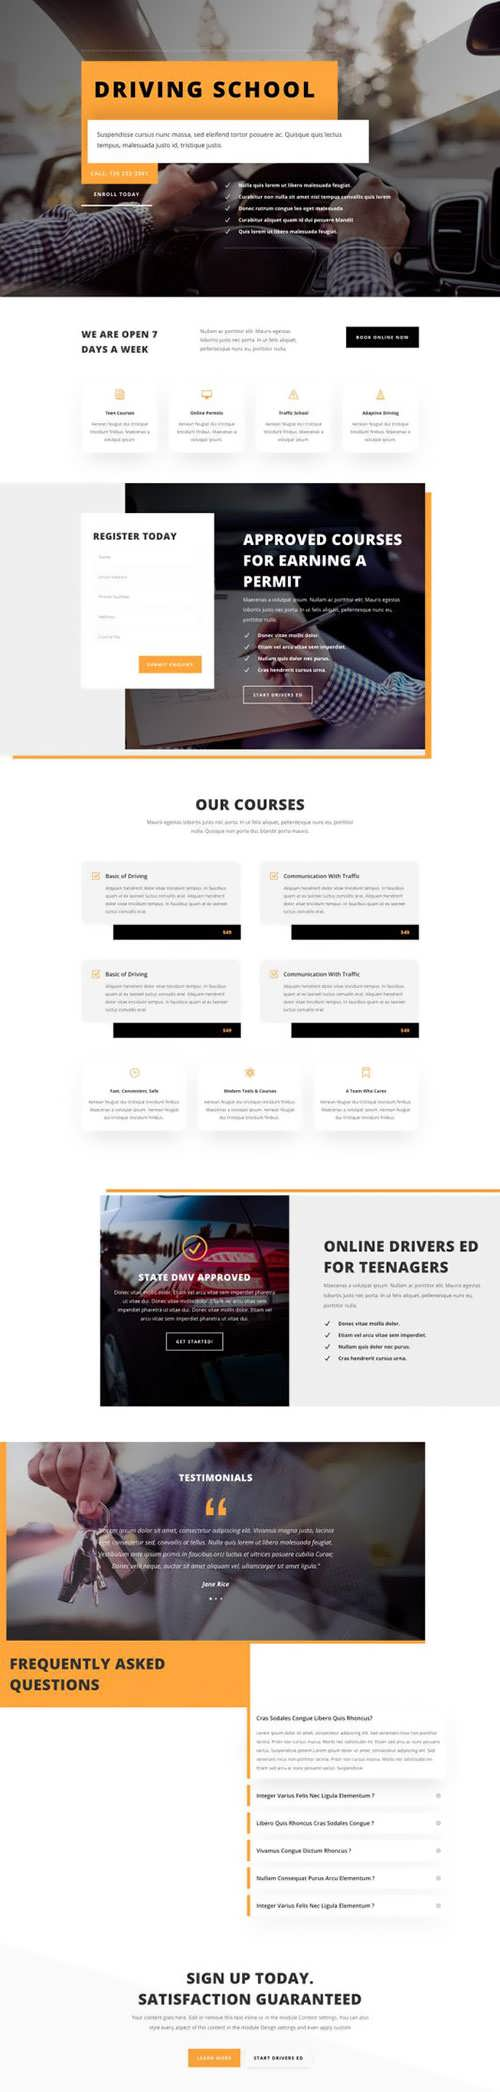 driving school landing page